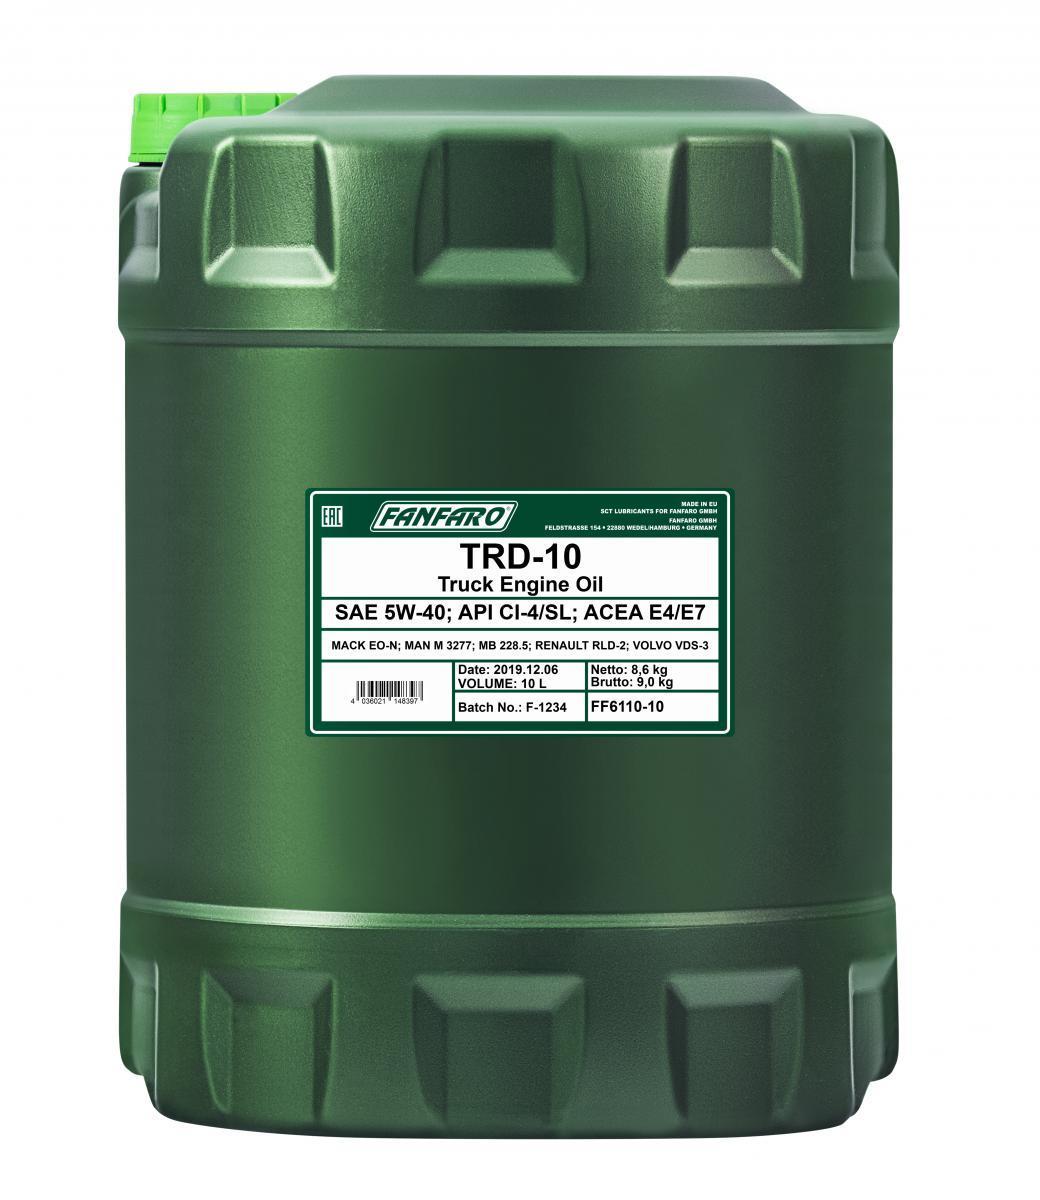 FF6110-10 FANFARO UHPD, TRD-10 5W-40, 10l, Synthetiköl Motoröl FF6110-10 günstig kaufen